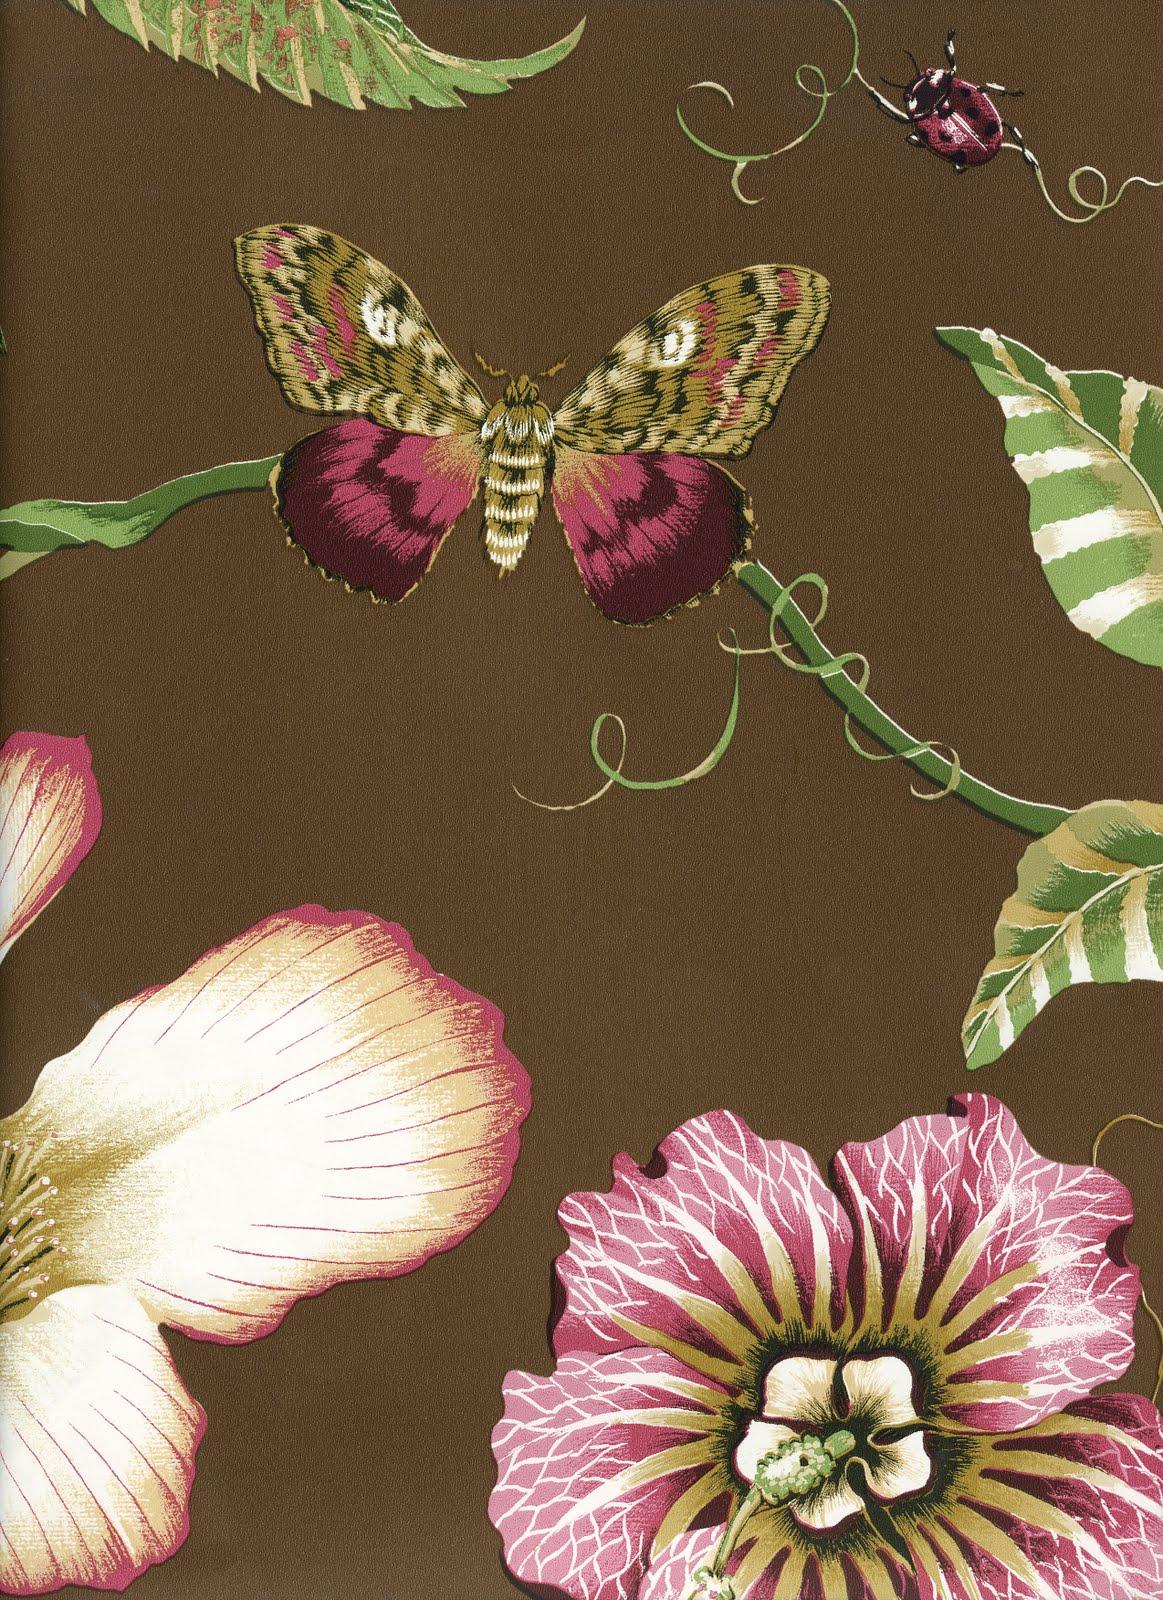 http://4.bp.blogspot.com/_u_EV8KxyKwY/S7ofQ4r8H_I/AAAAAAAAACw/cgVkbIn0cw0/s1600/Raia+wallpaper.jpg